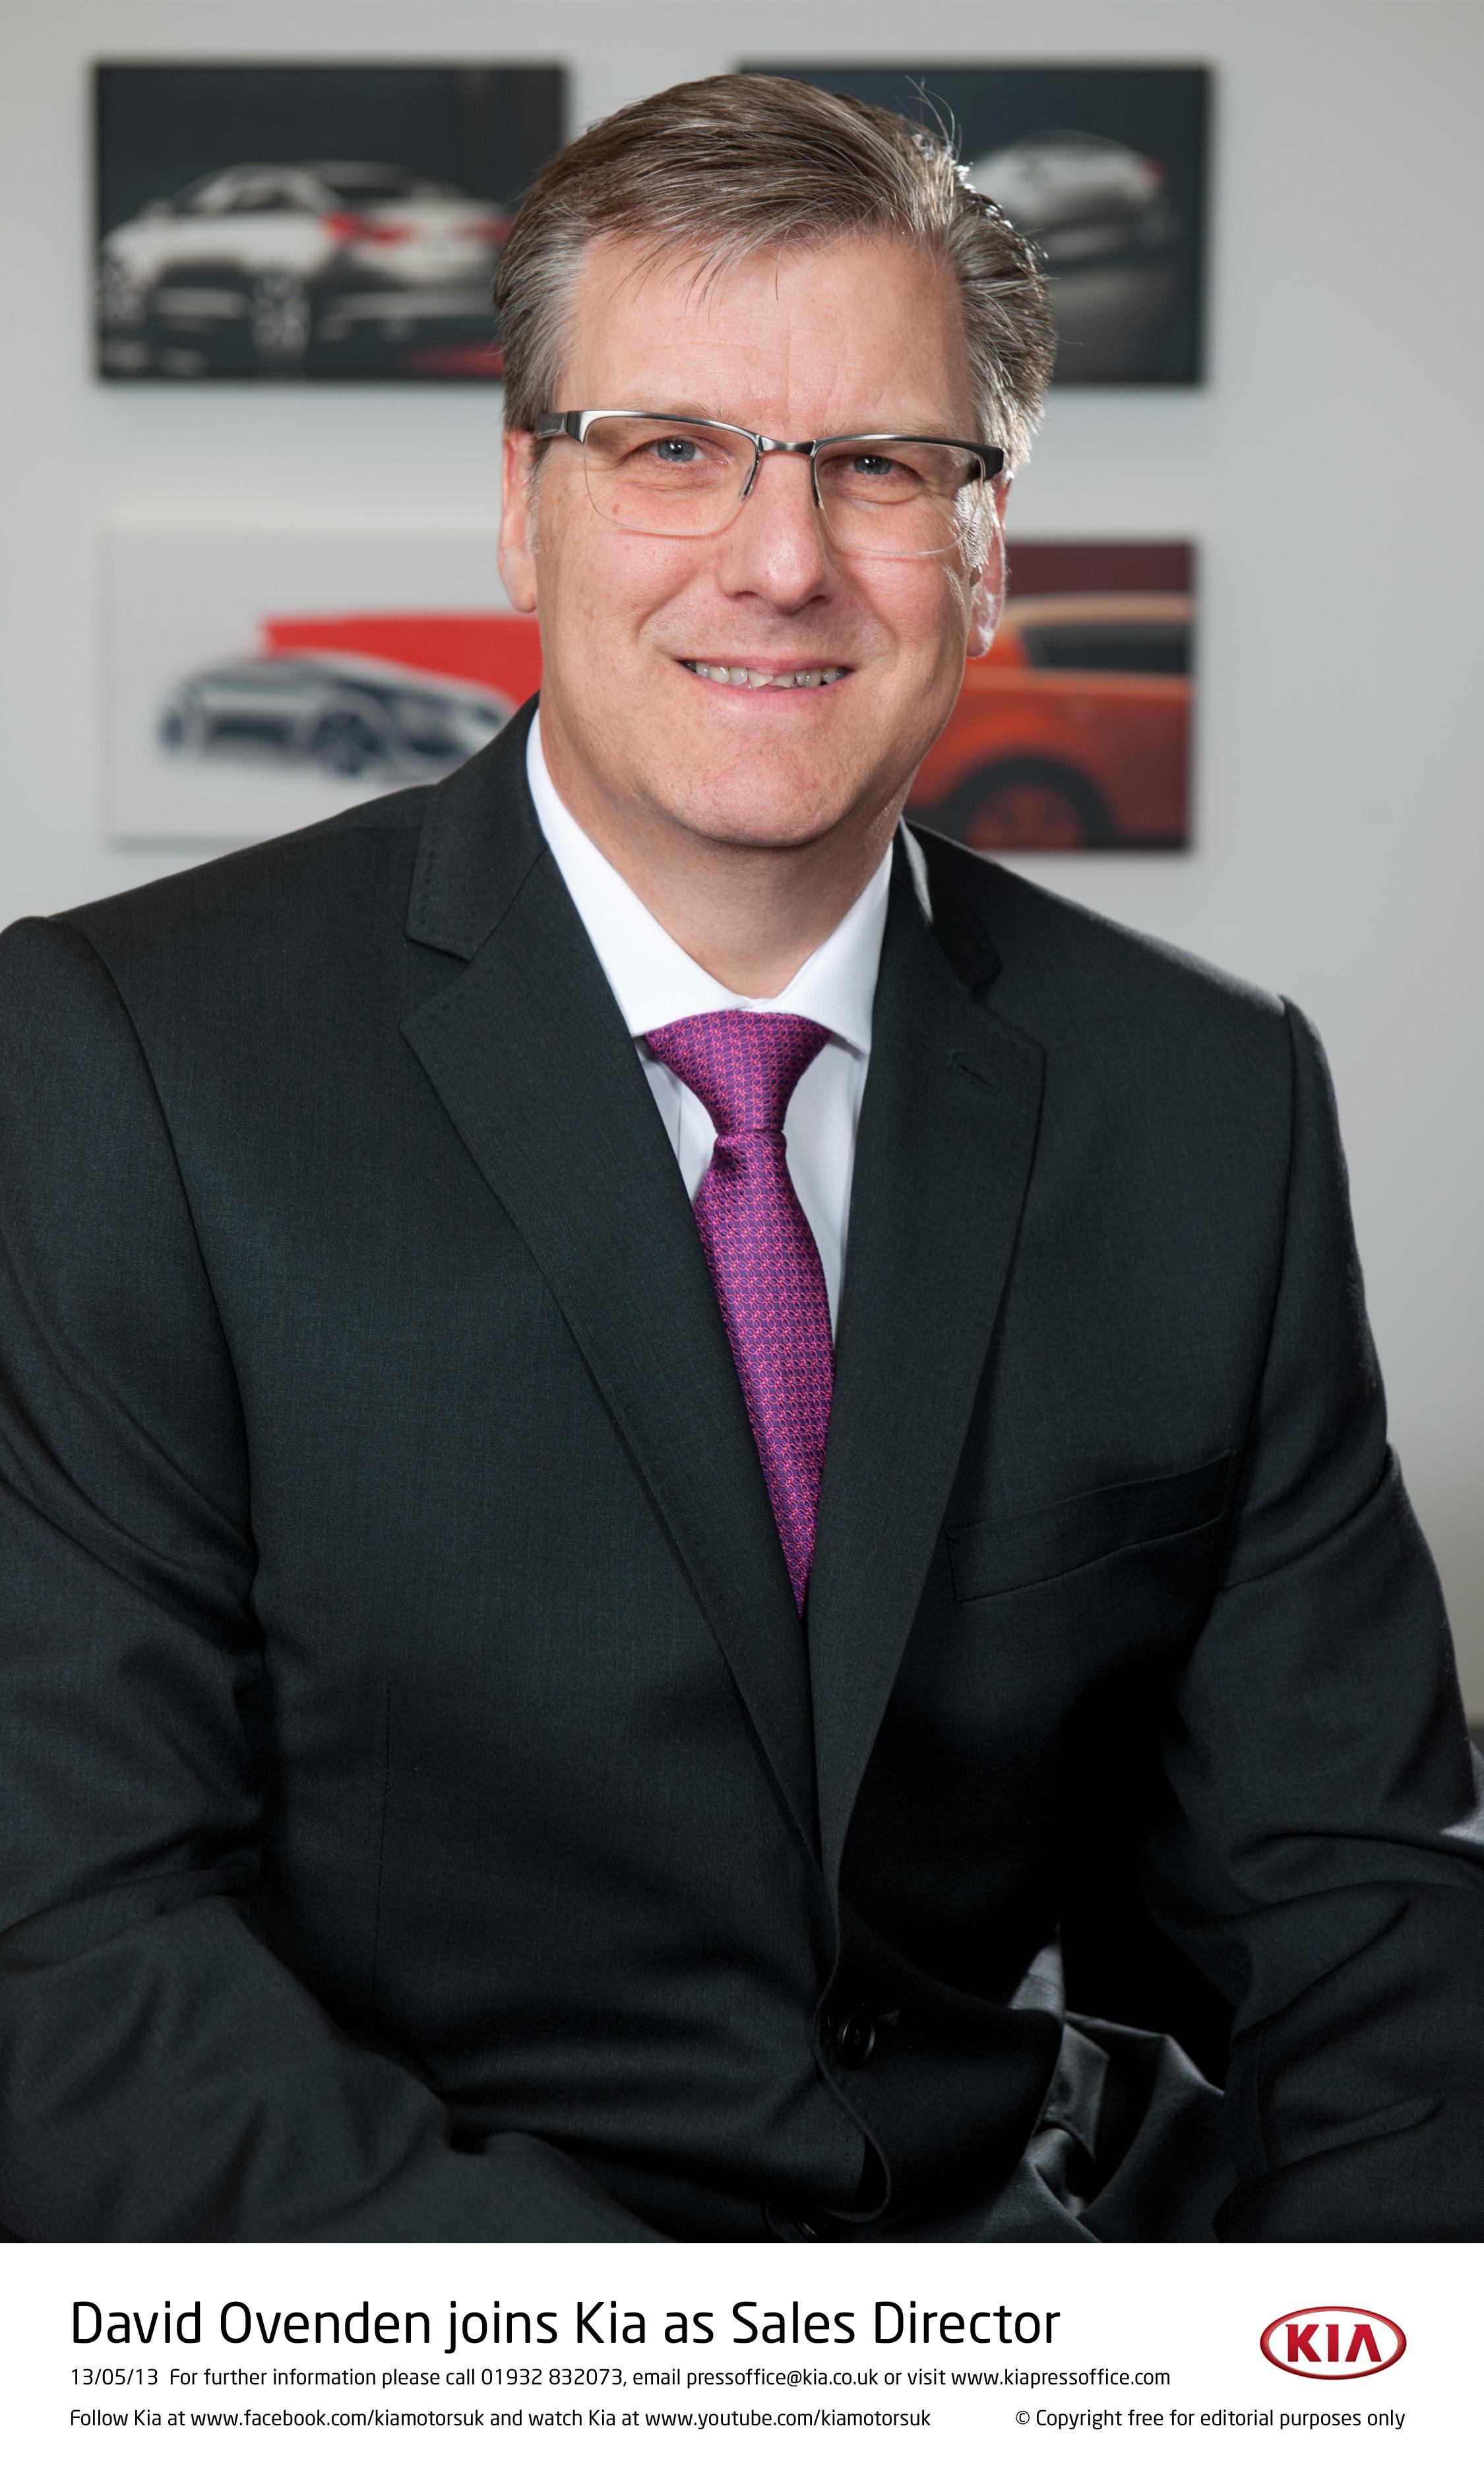 David Ovenden